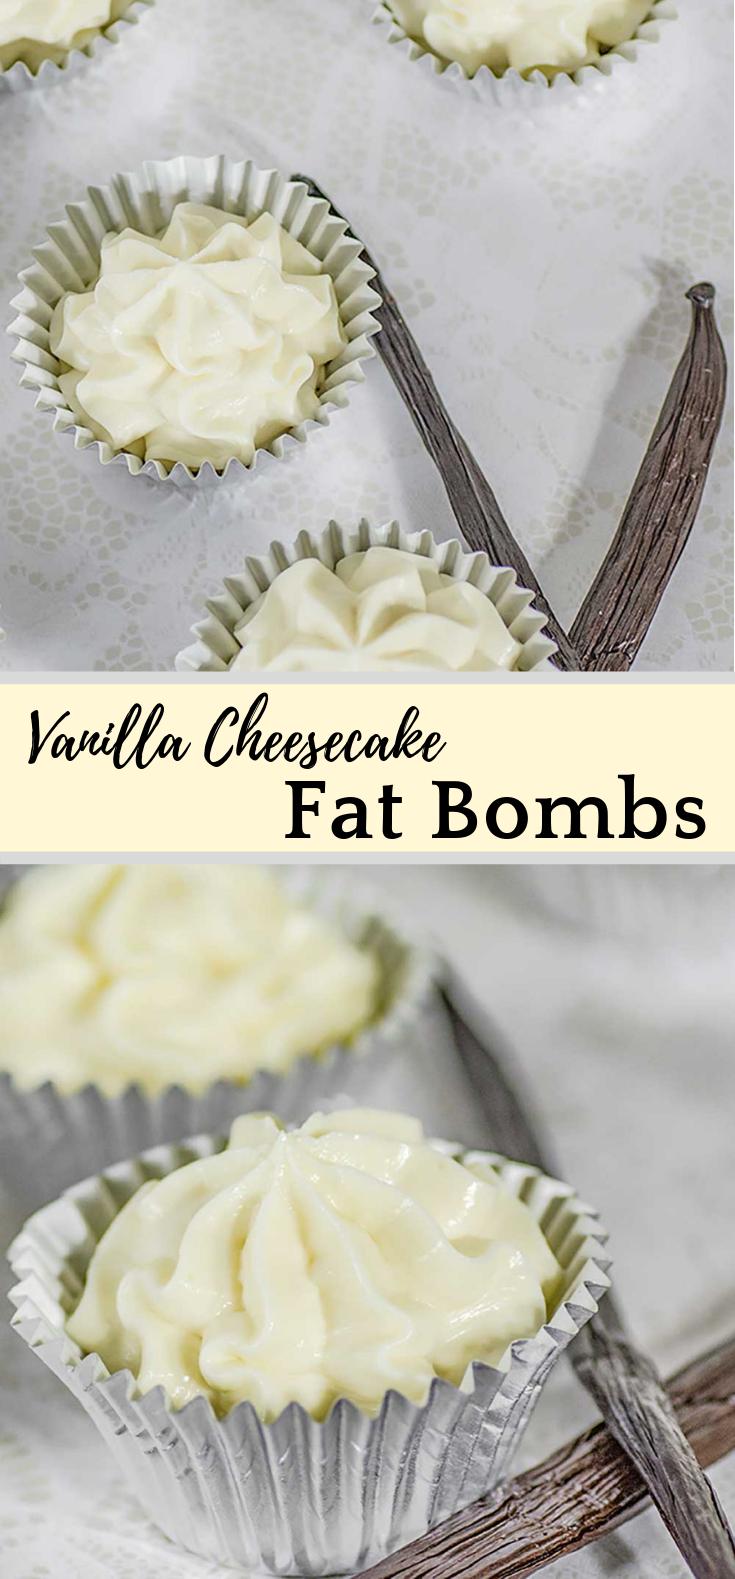 Vanilla Cheesecake Fat Bombs #Diet #Keto